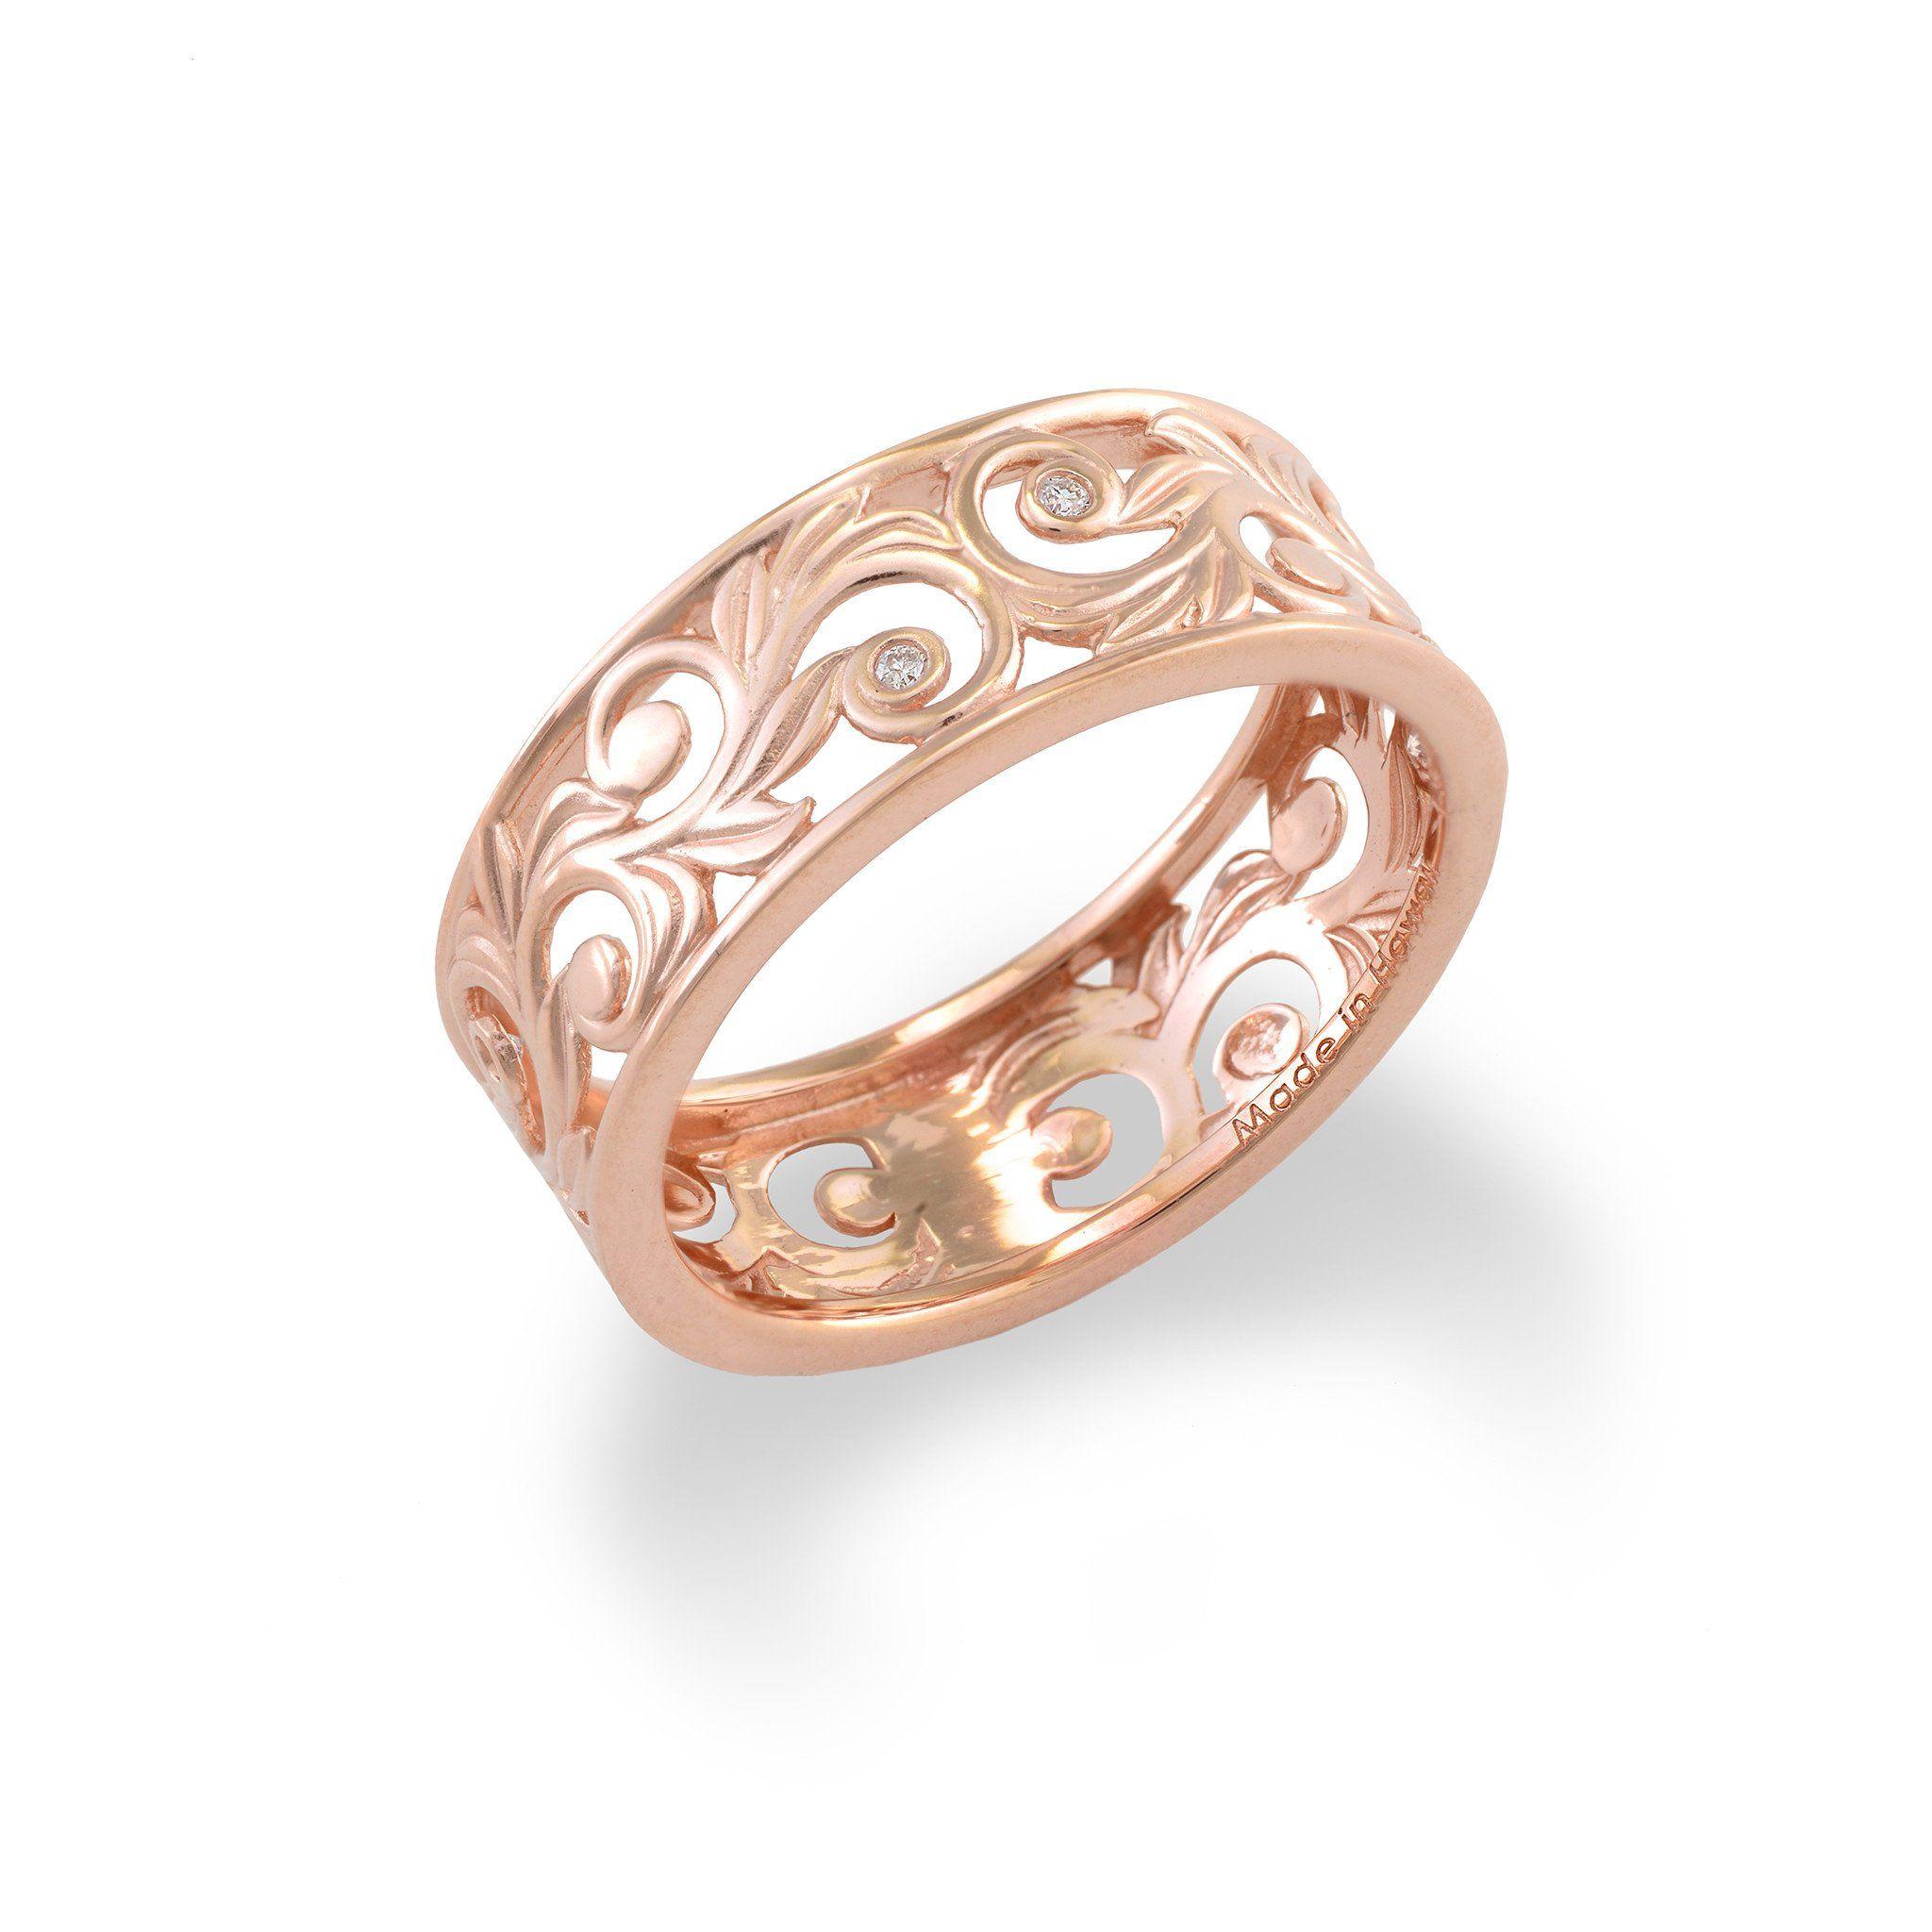 Hawaiian heirloom scroll mm ring with diamonds in k rose gold